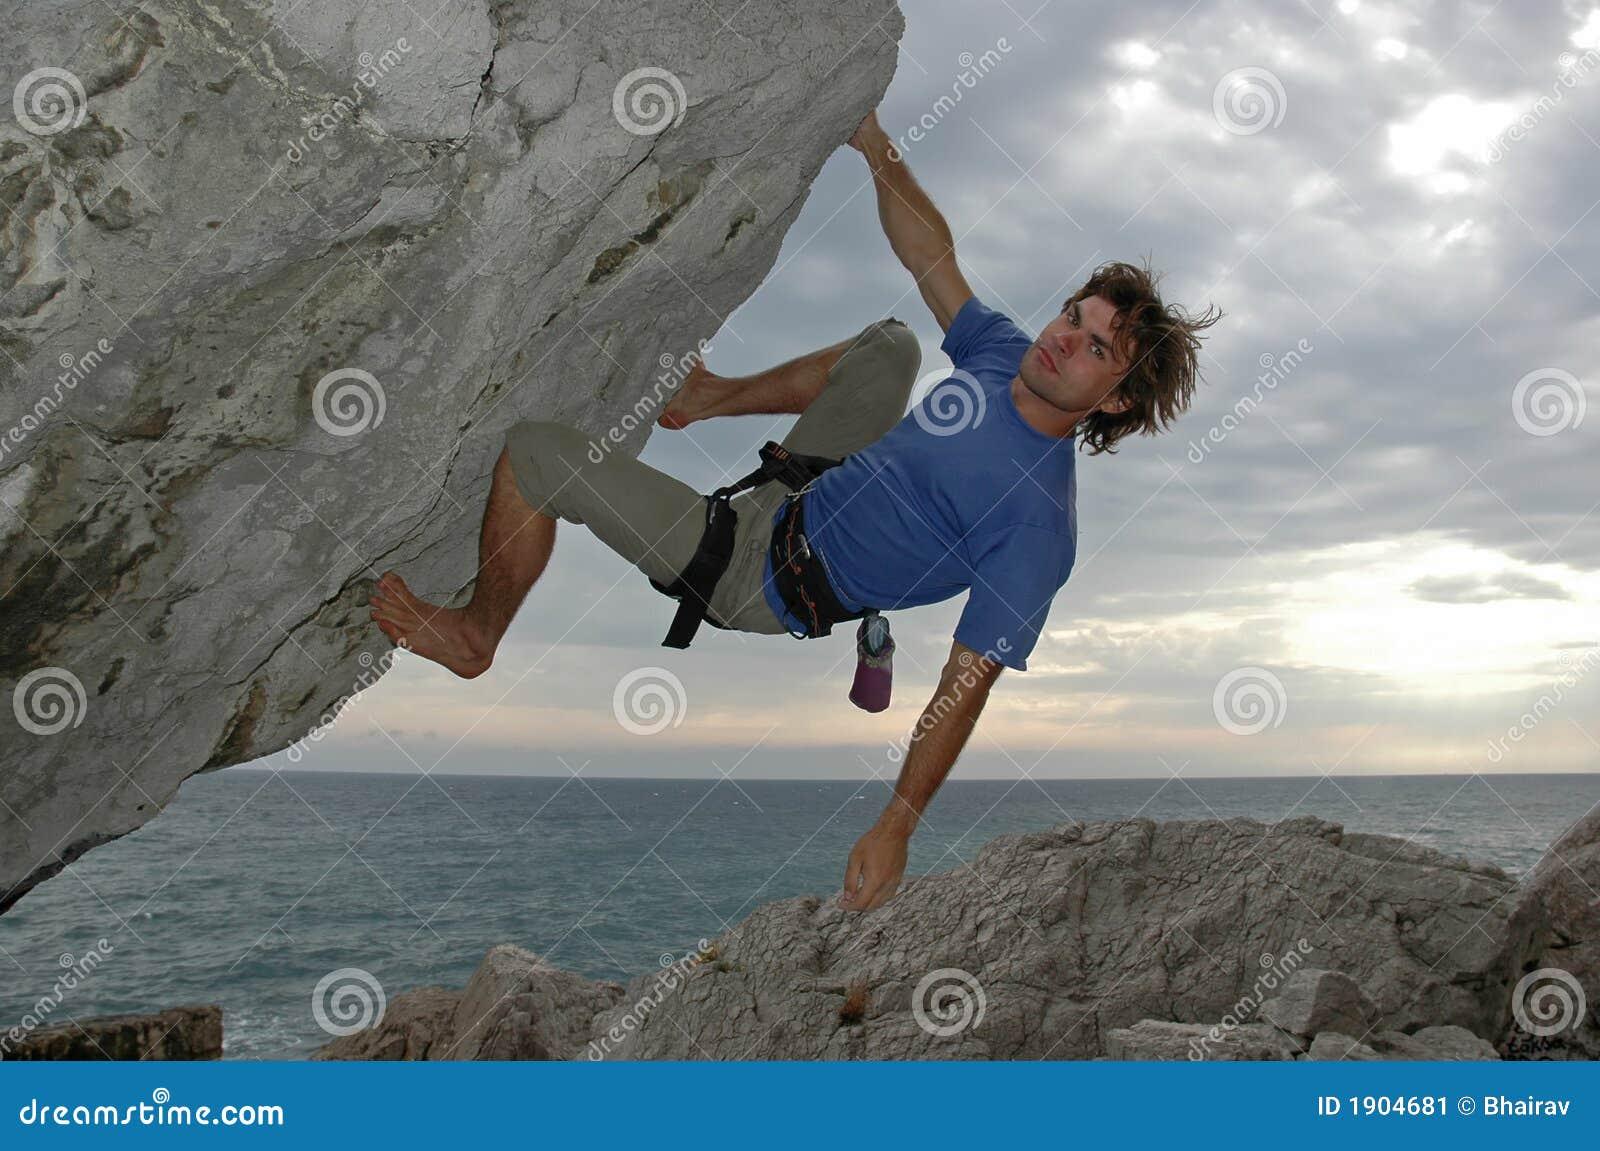 The climb #3